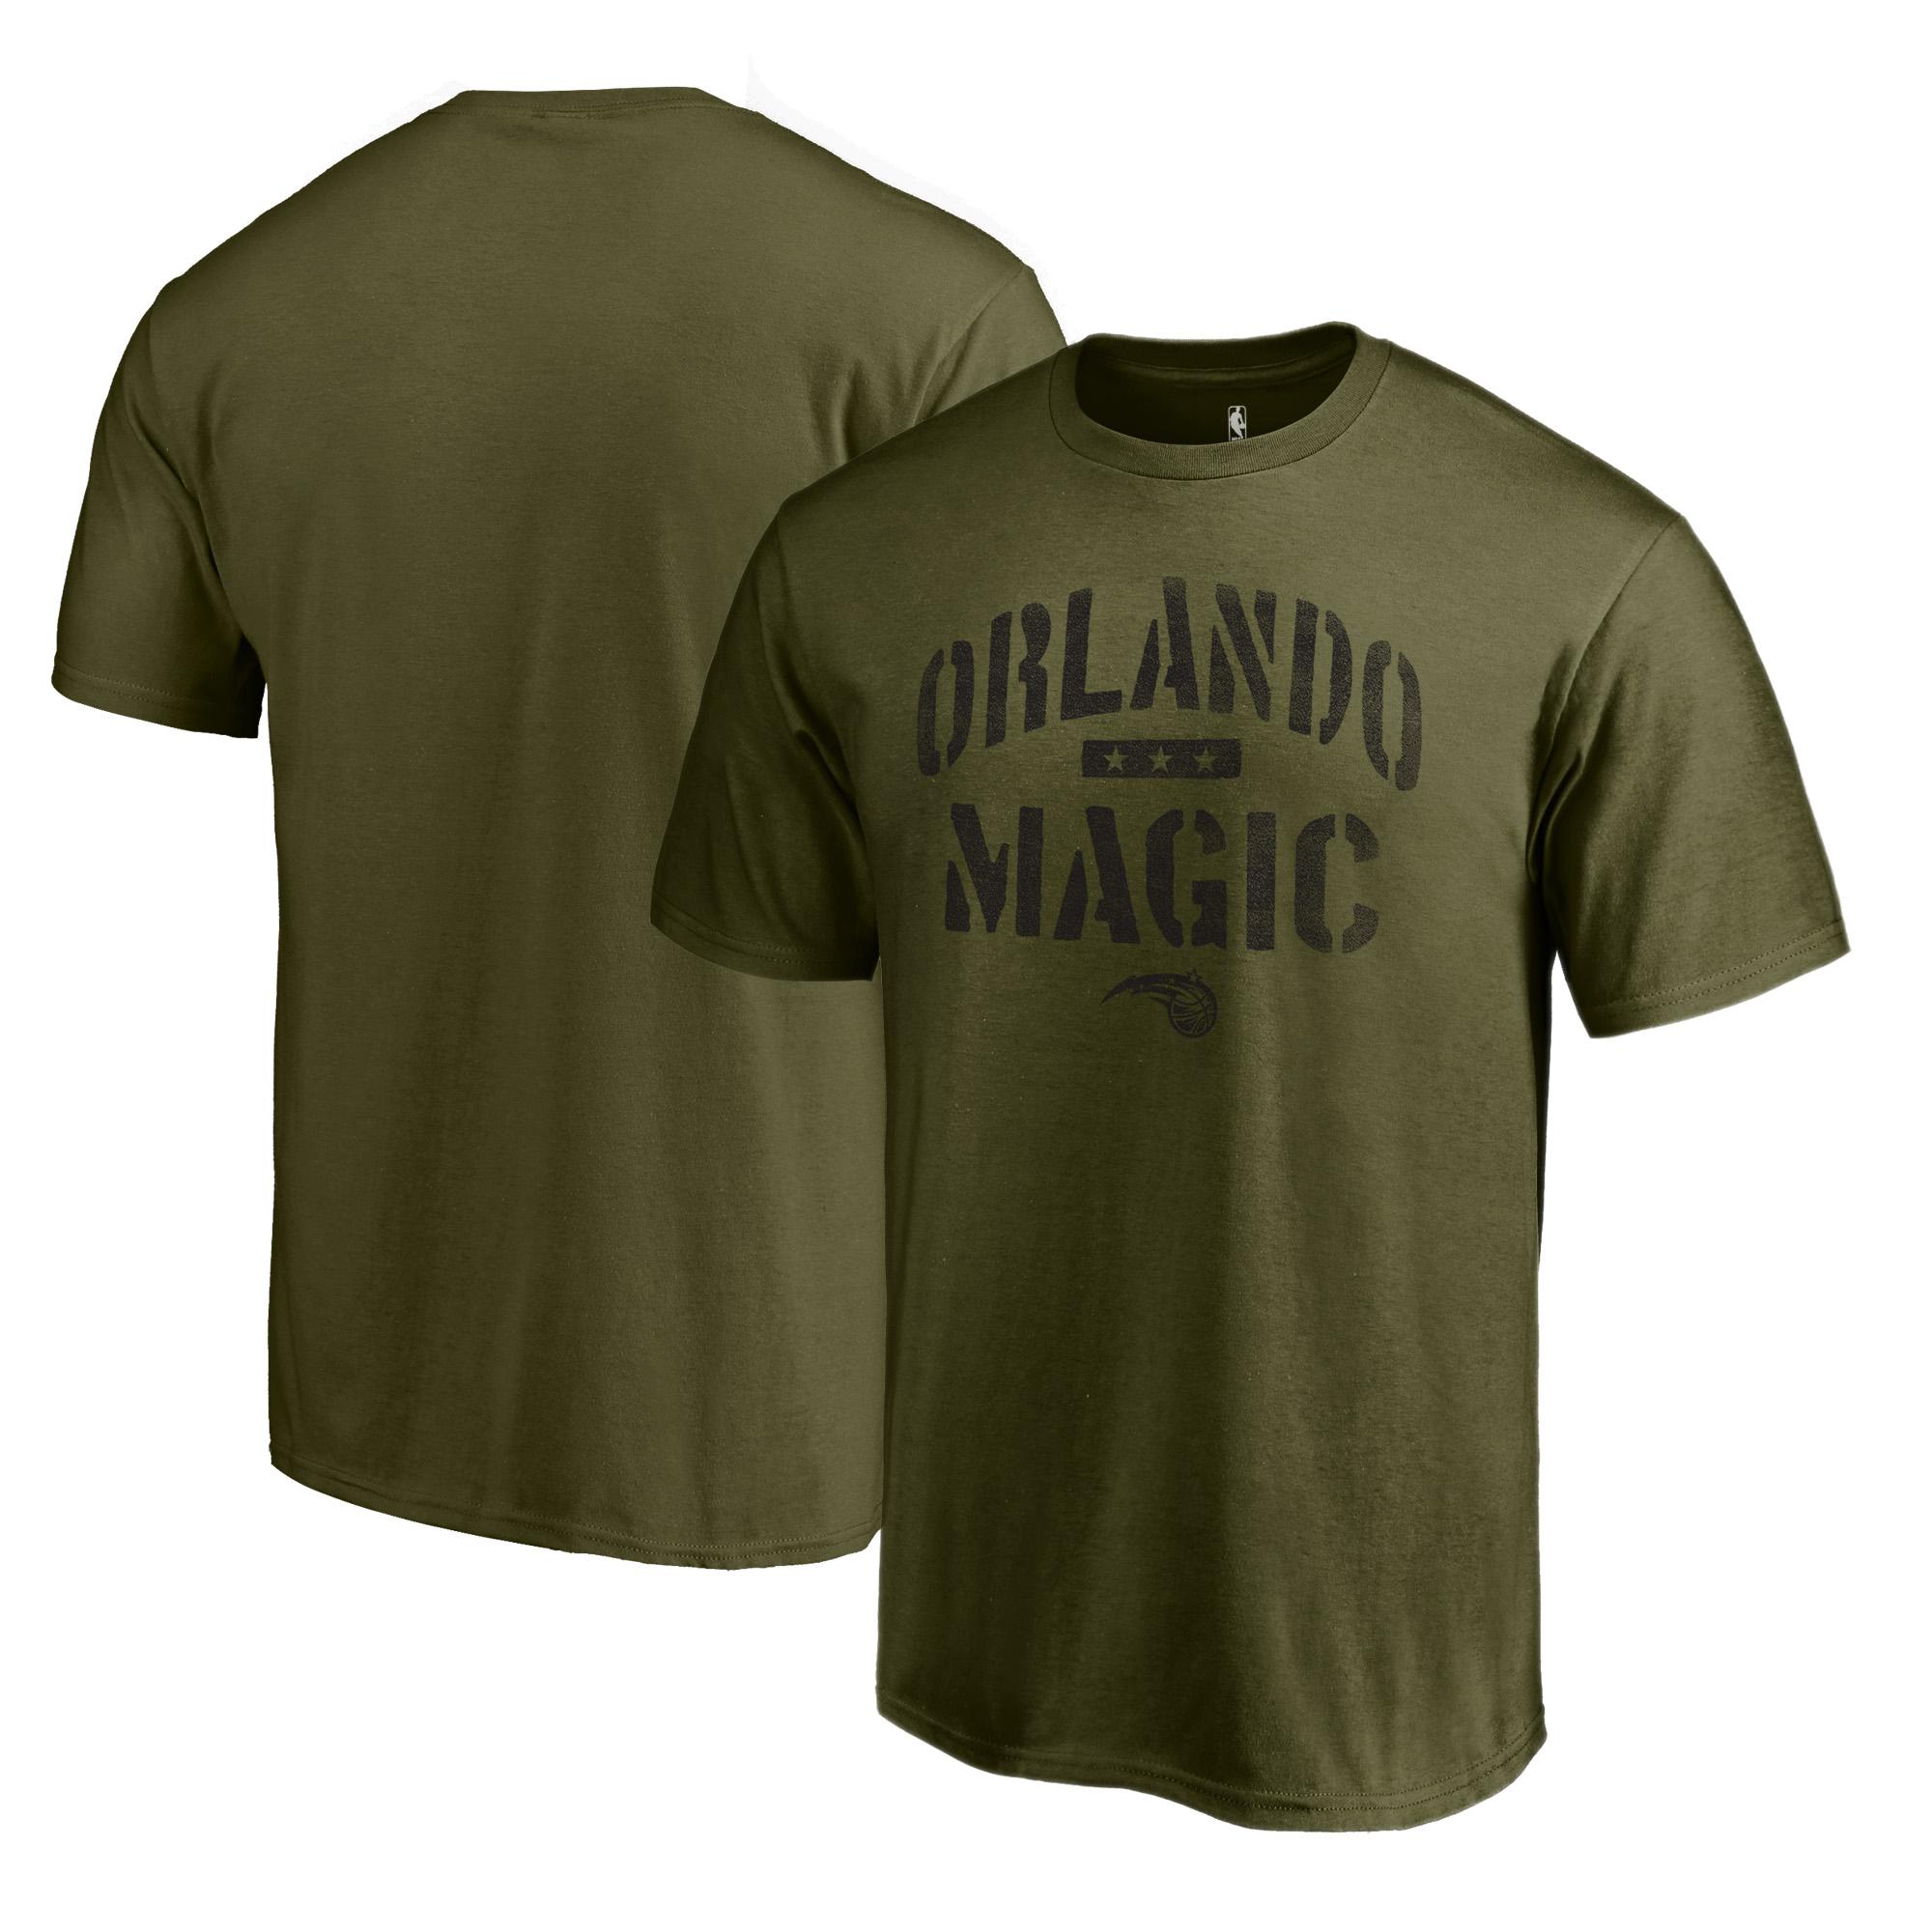 Orlando Magic Fanatics Branded Camo Collection Jungle T-Shirt - Green